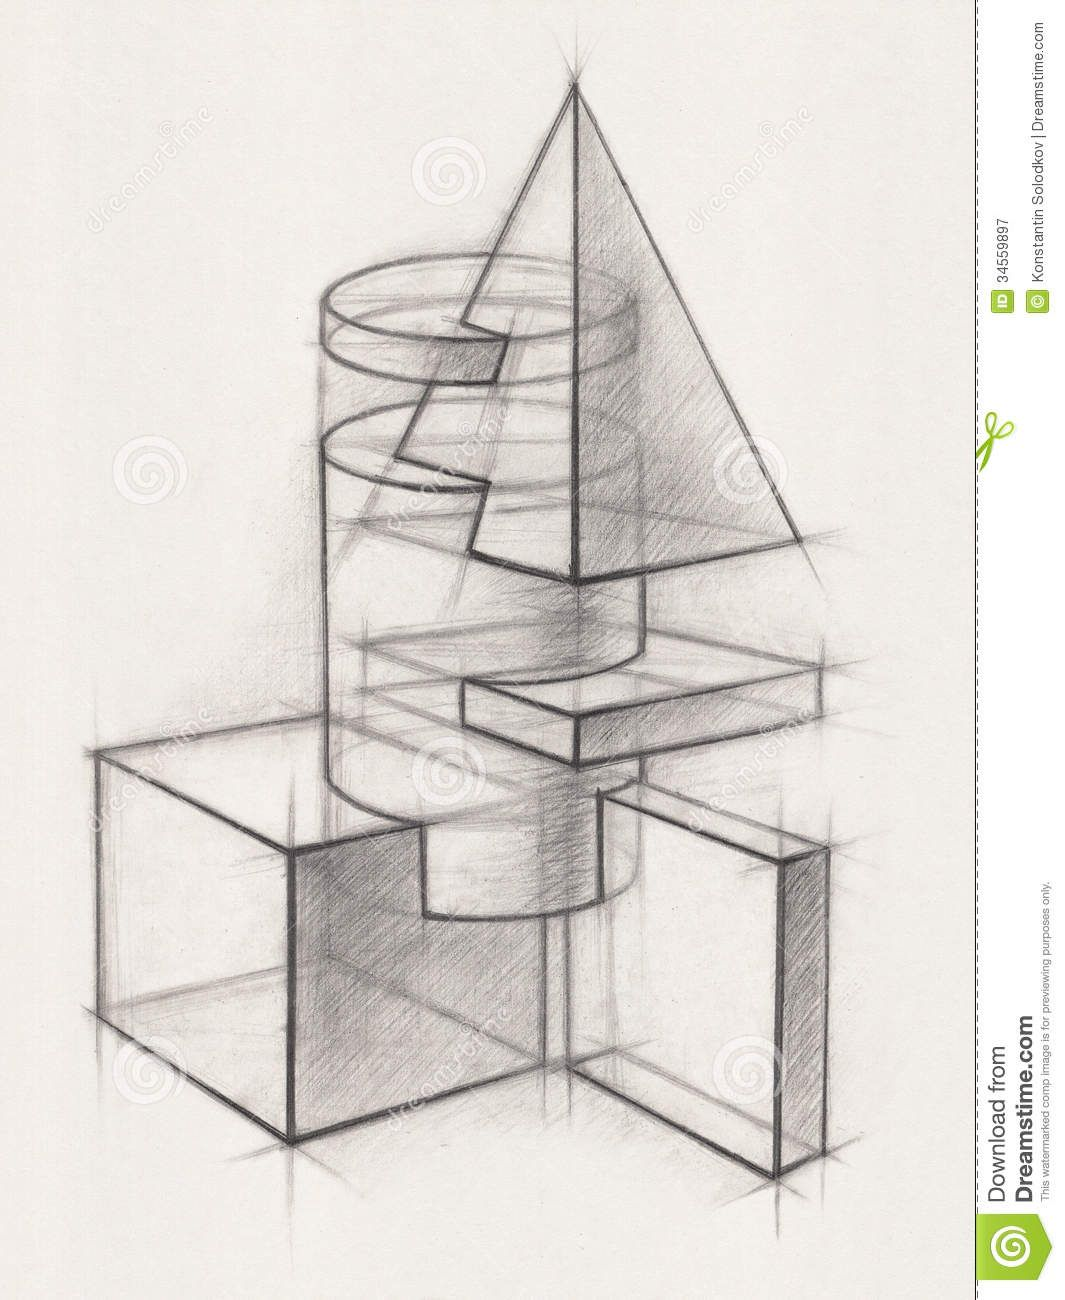 Pix For Gt Geometric Shape Drawing